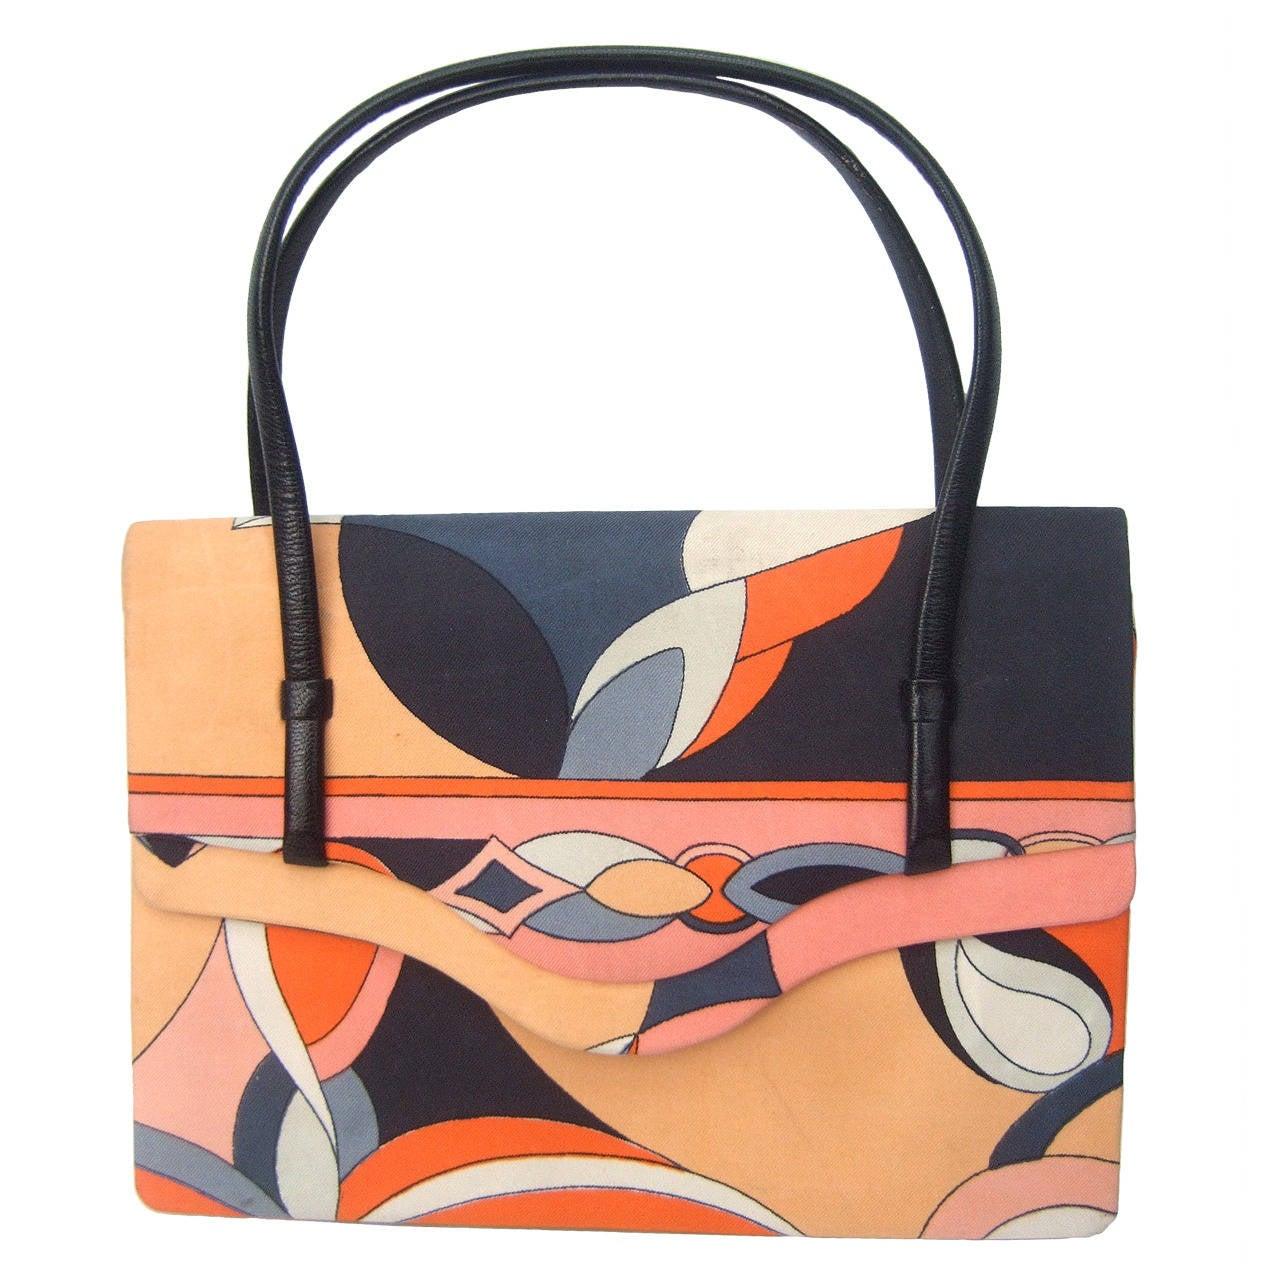 Emilio Pucci Italy Silk Diminutive Envelope Style Handbag c 1970 For Sale